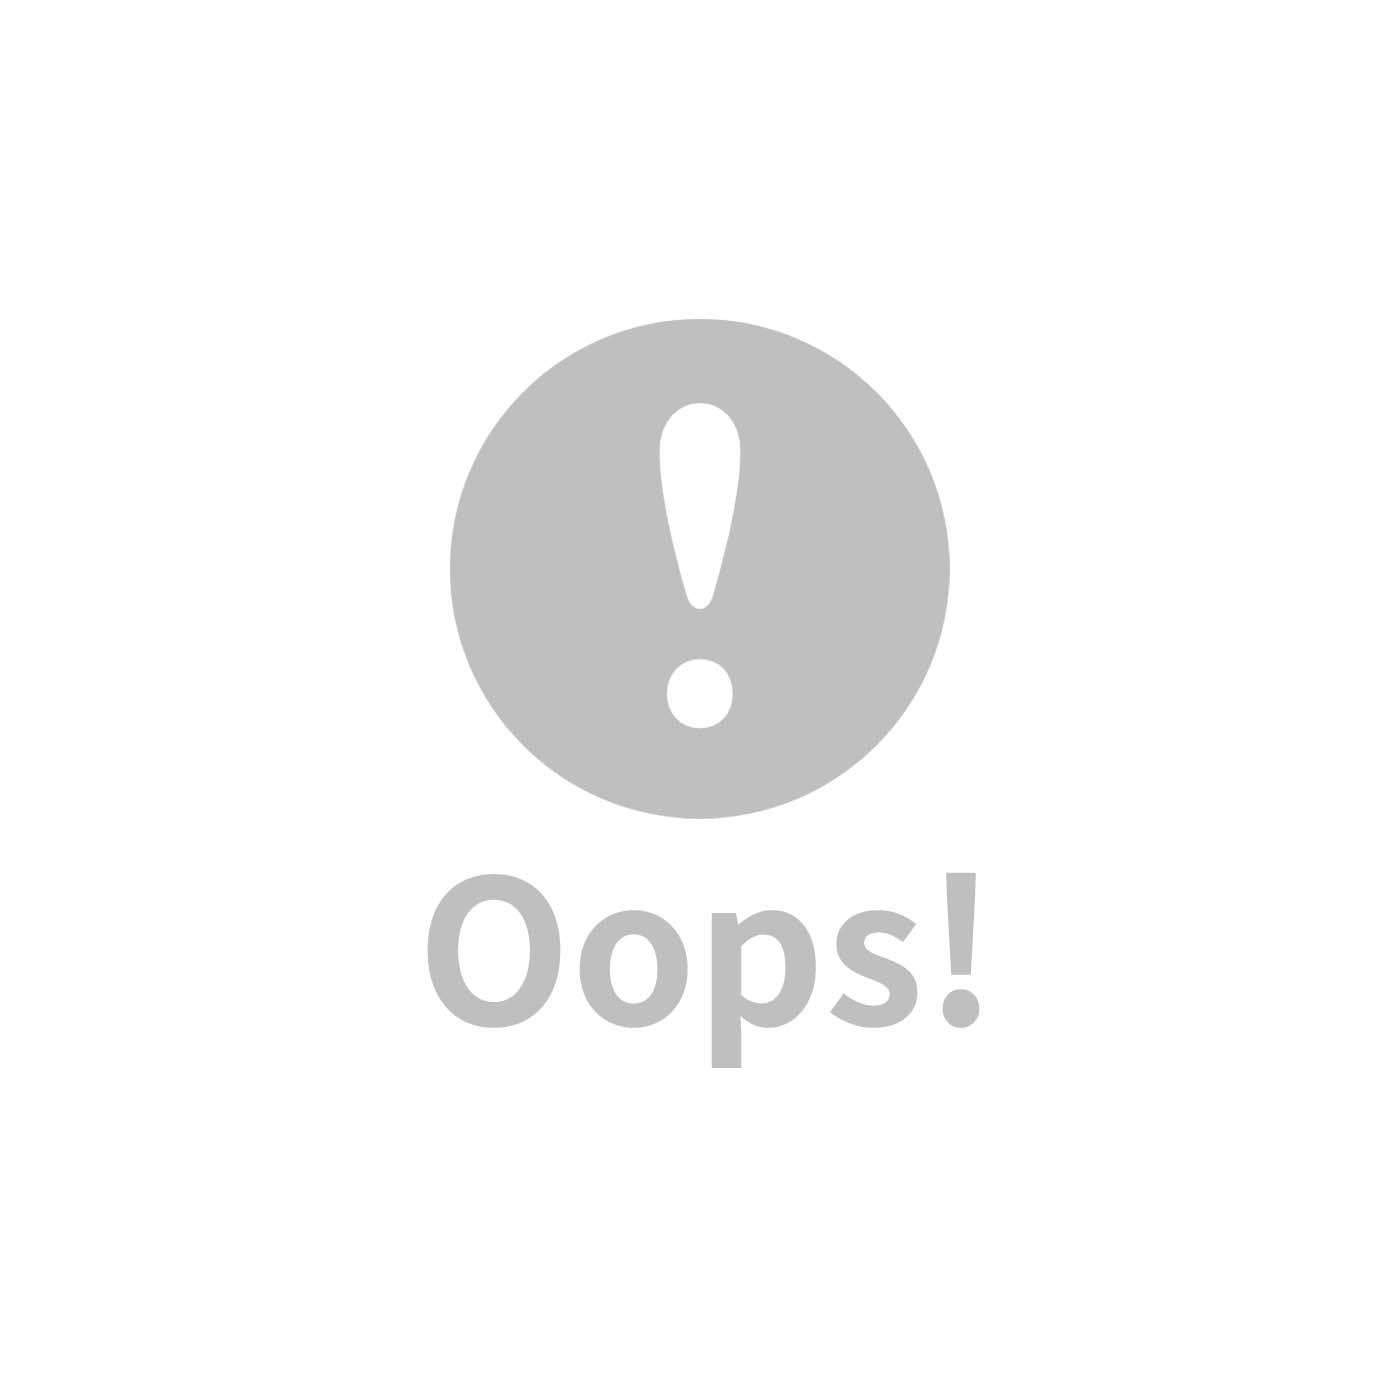 global affairs 童話手工編織安撫搖鈴_HERO系列(綠勇士)